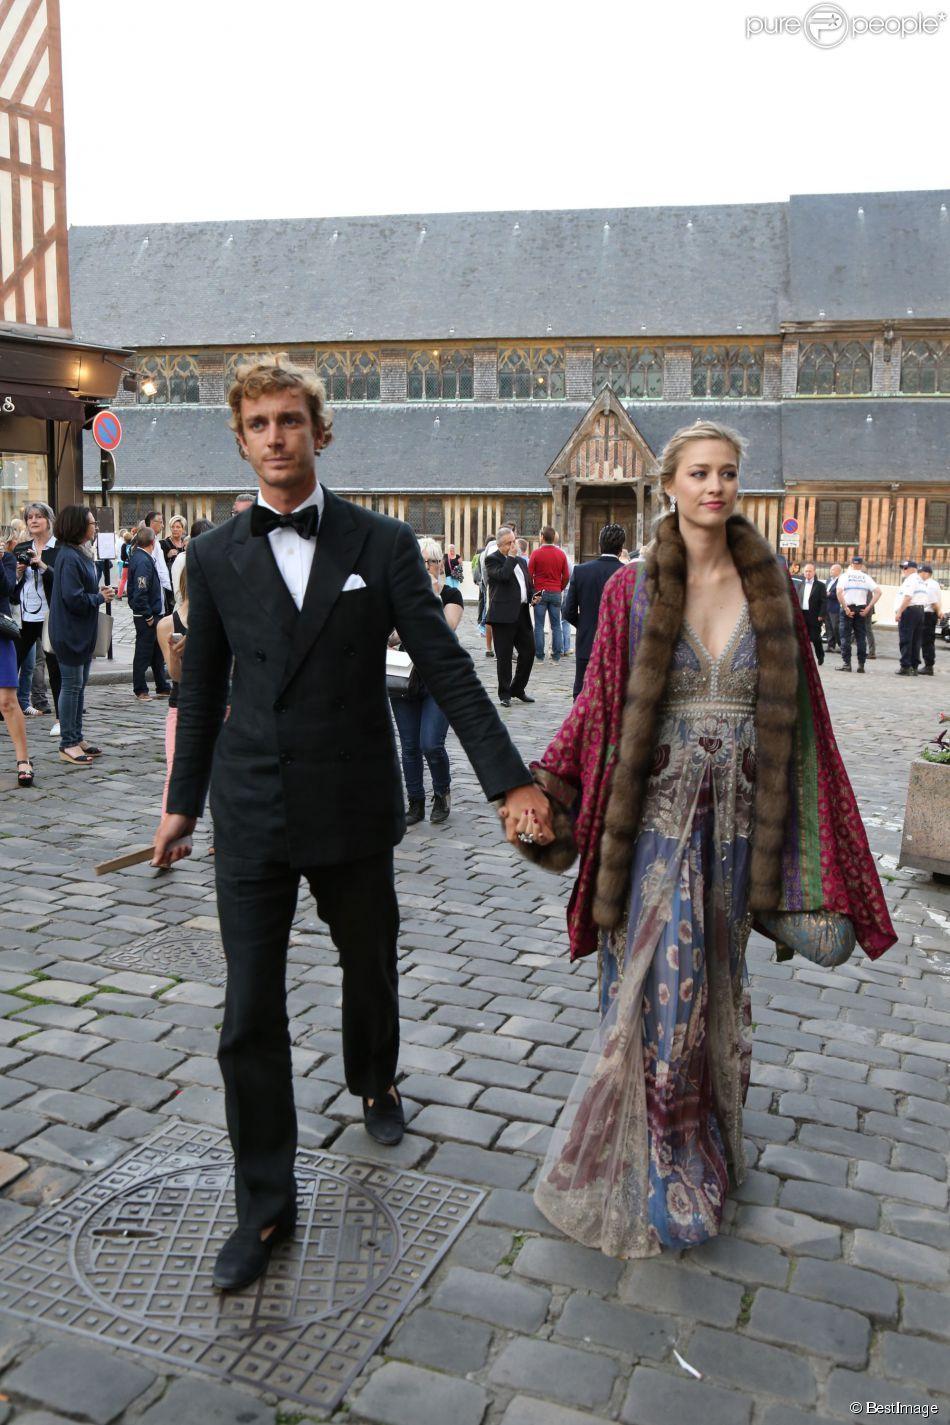 The Wedding Of Noor Fares And Alexandre Al Khawam Fashion Beatrice Borromeo Editorial Fashion